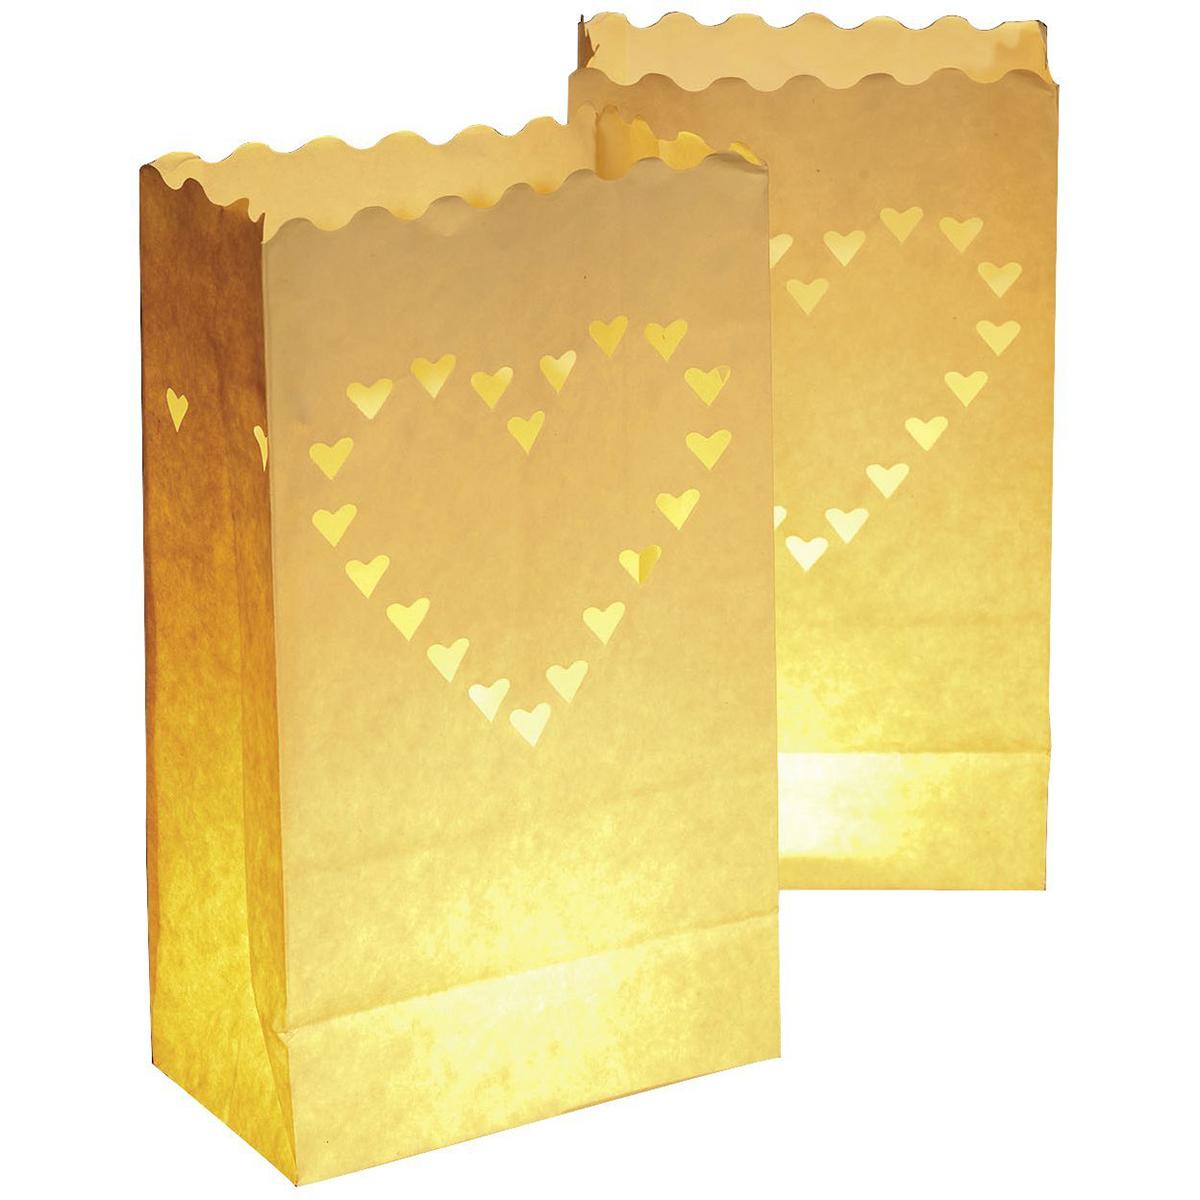 10pcs Novelty Heart Shaped Luminary Tealight Candle Bags Luminaria lantern bag party wedding decorations(China (Mainland))